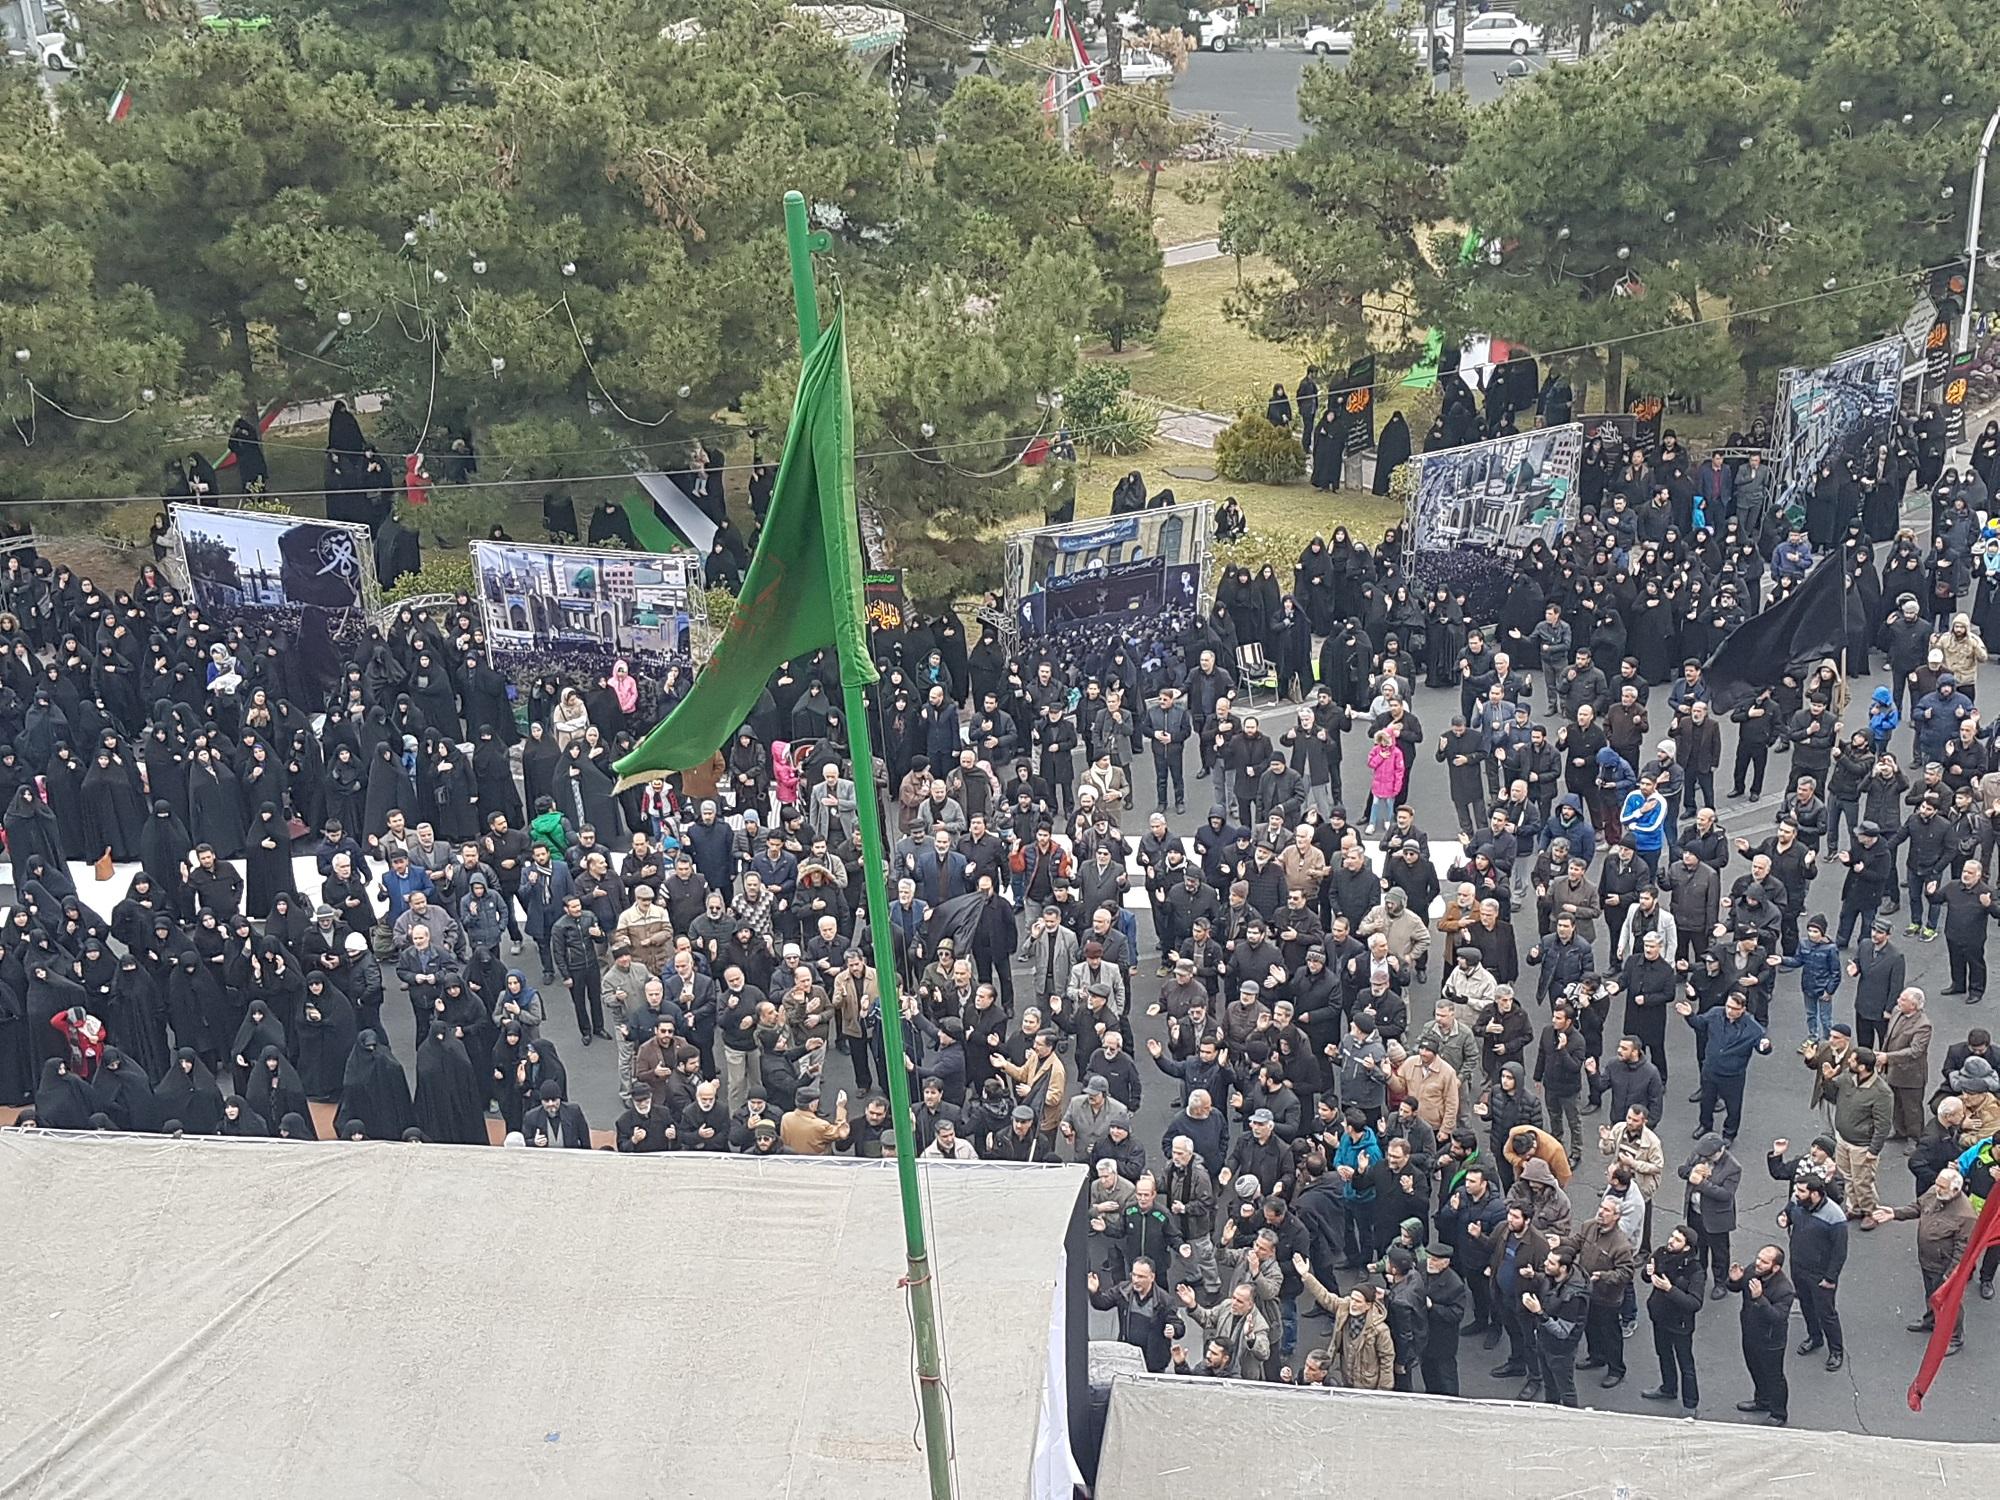 تجمع بزرگ فاطمیون سعادتآباد برگزار شد +تصاویر